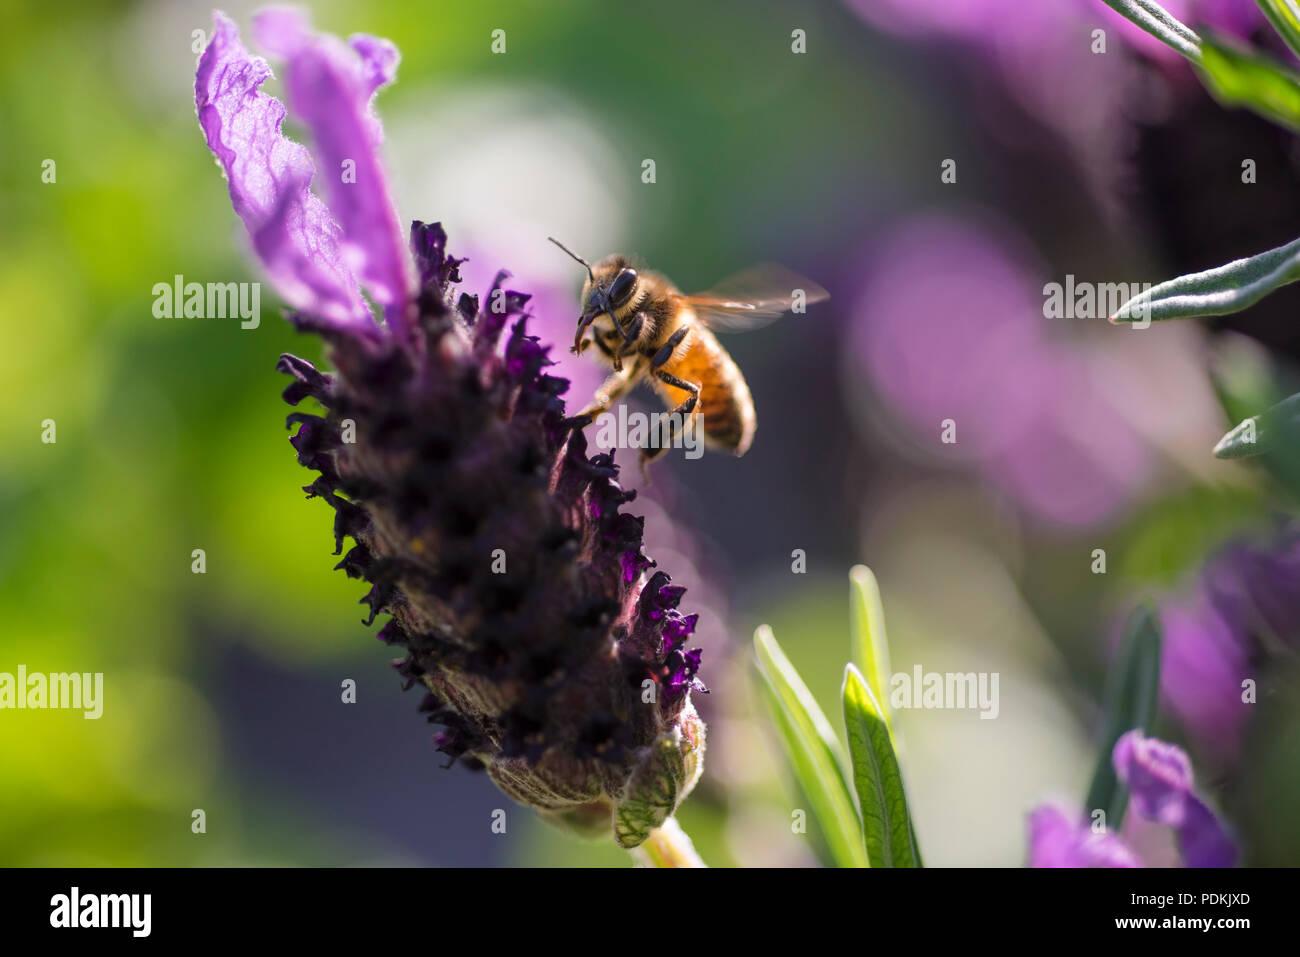 Bee landing on lavender flower, Australia, close up view - Stock Image